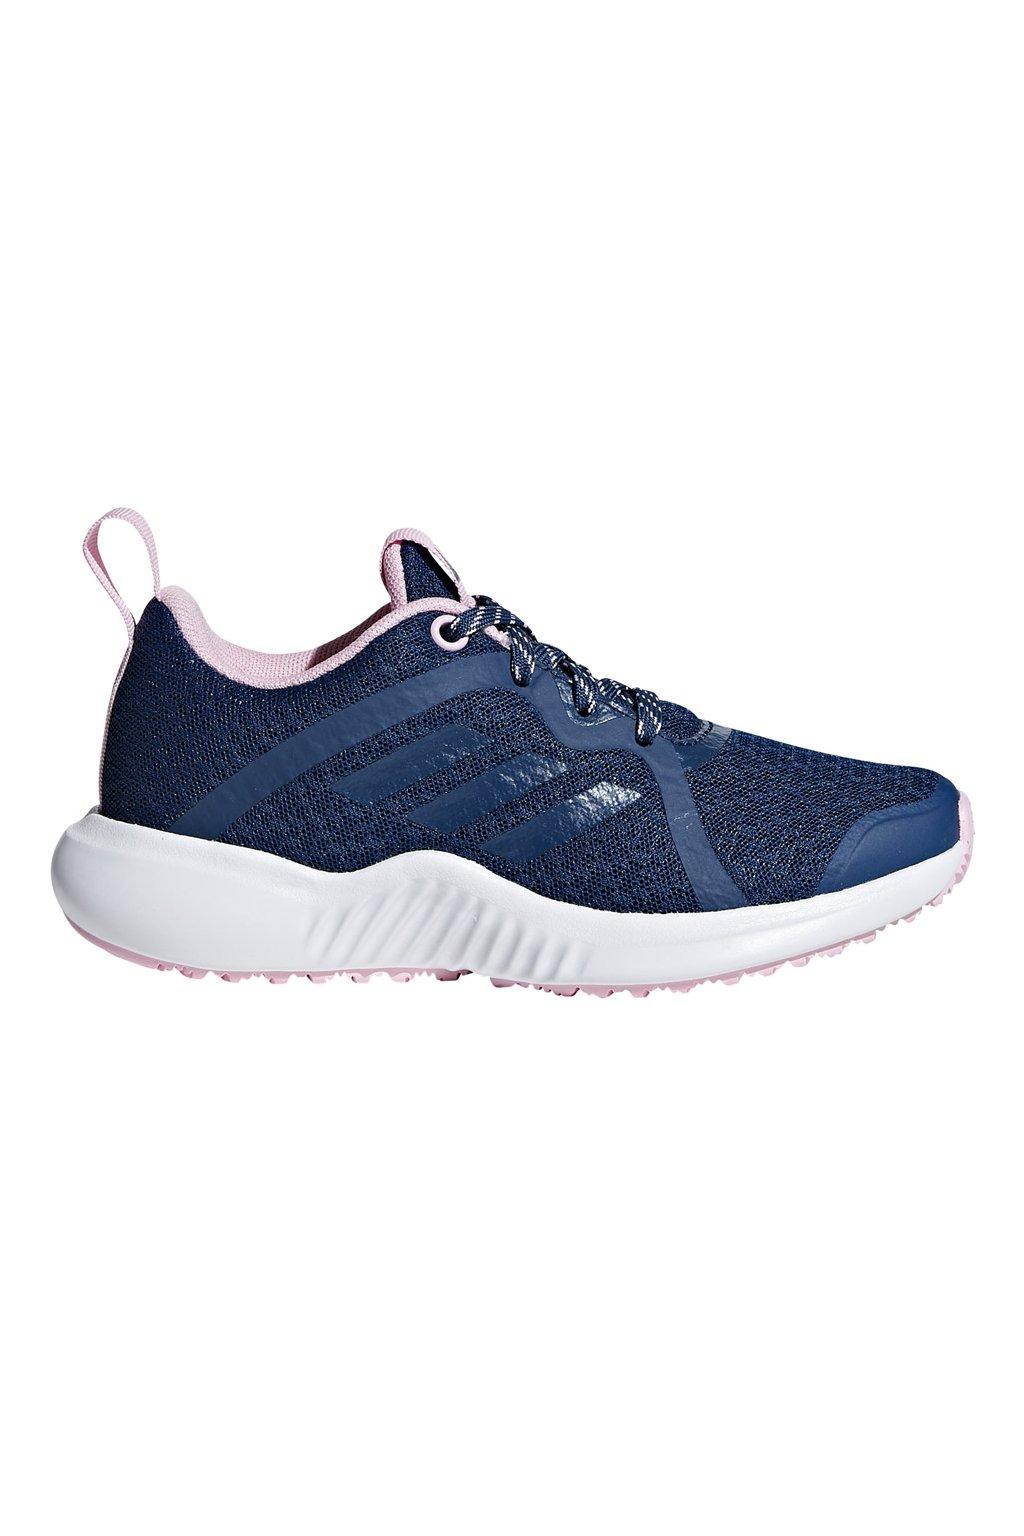 Detská obuv Adidas FortaRun XK D96948